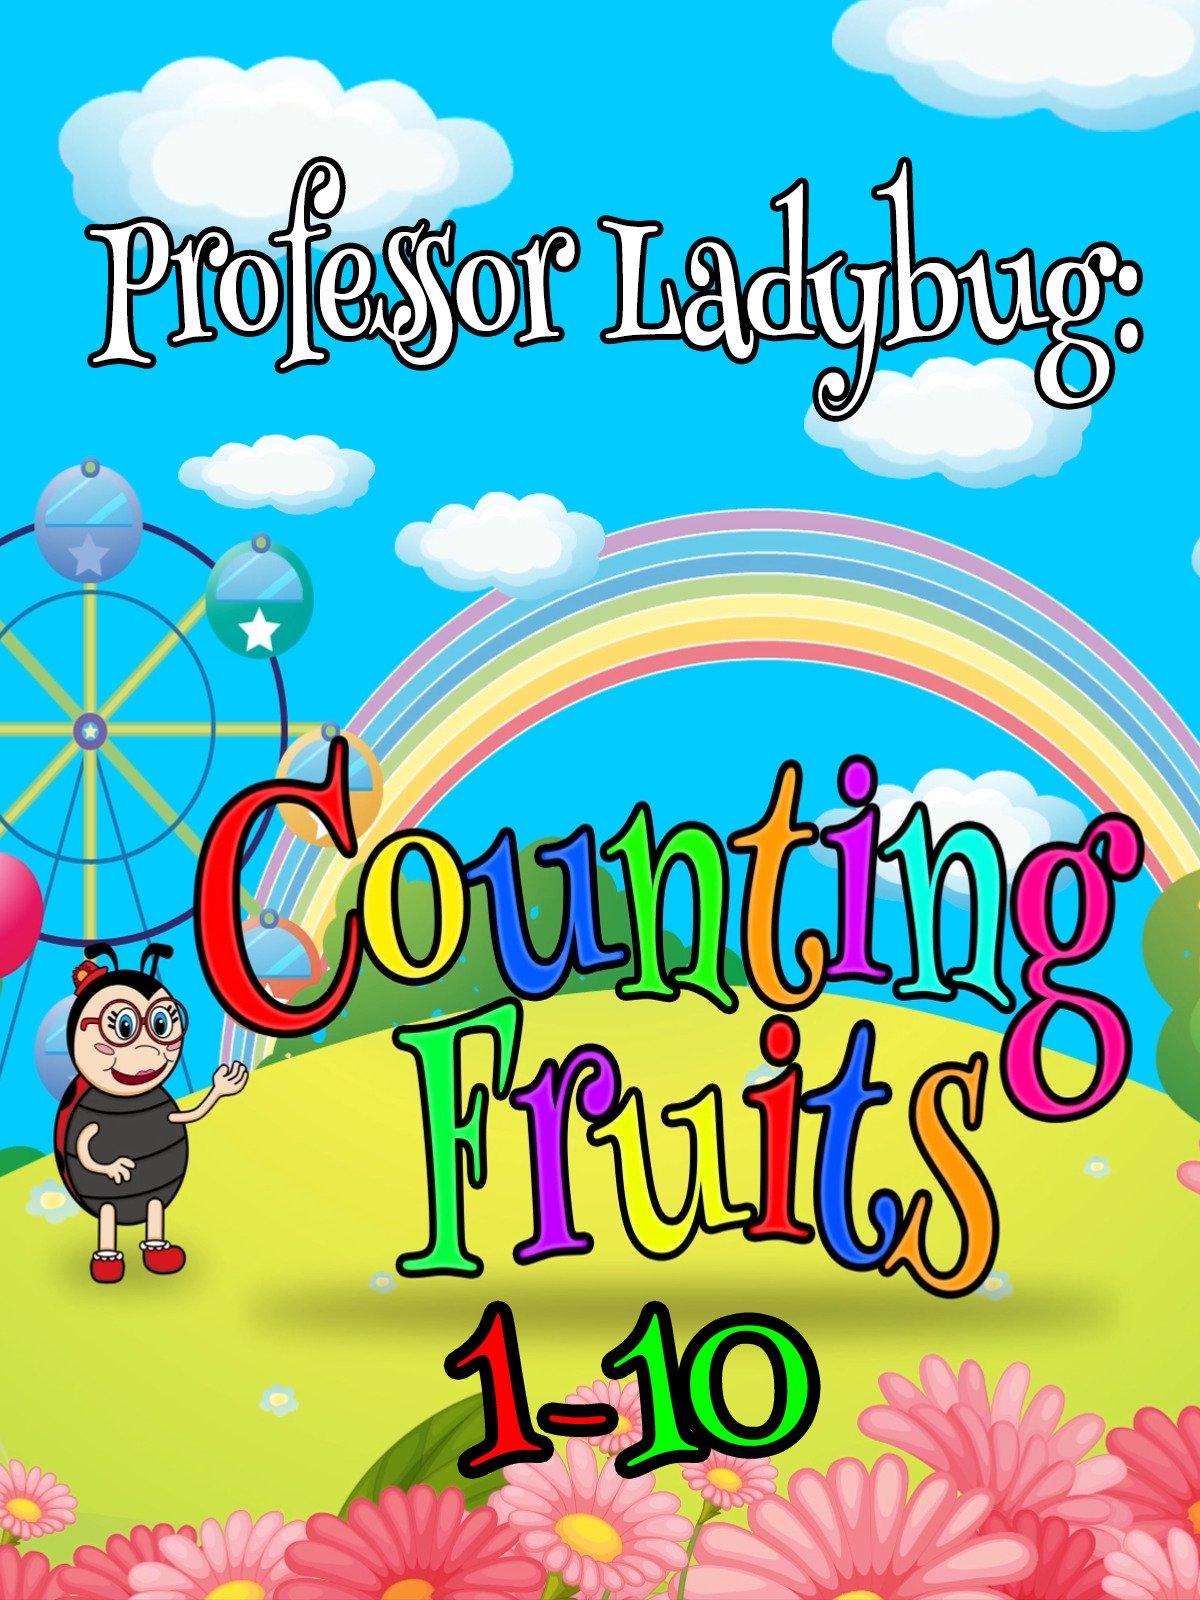 Professor Ladybug: Counting Fruits 1-10